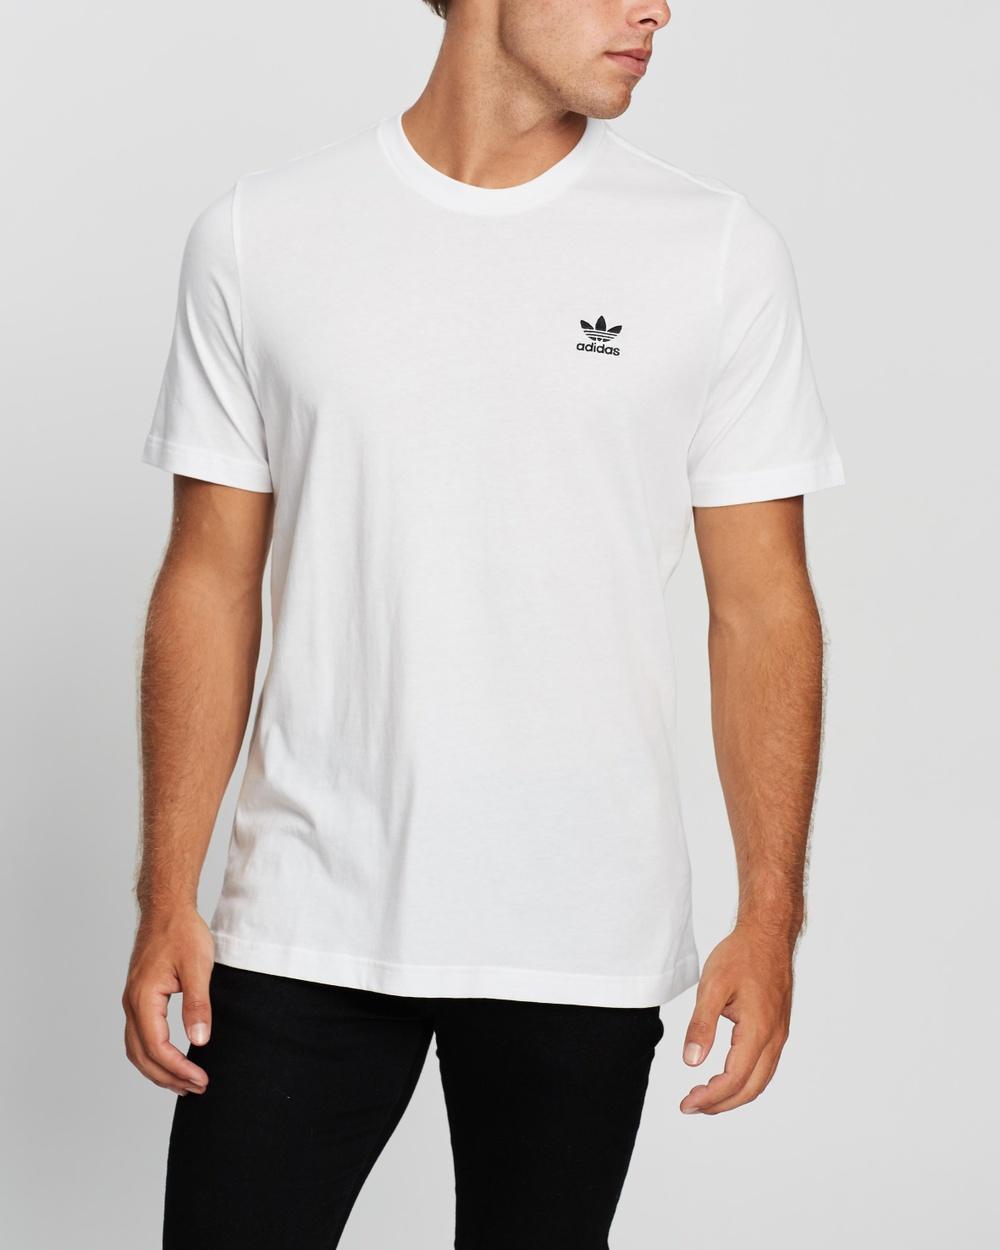 adidas Originals Essential Tee T-Shirts & Singlets White